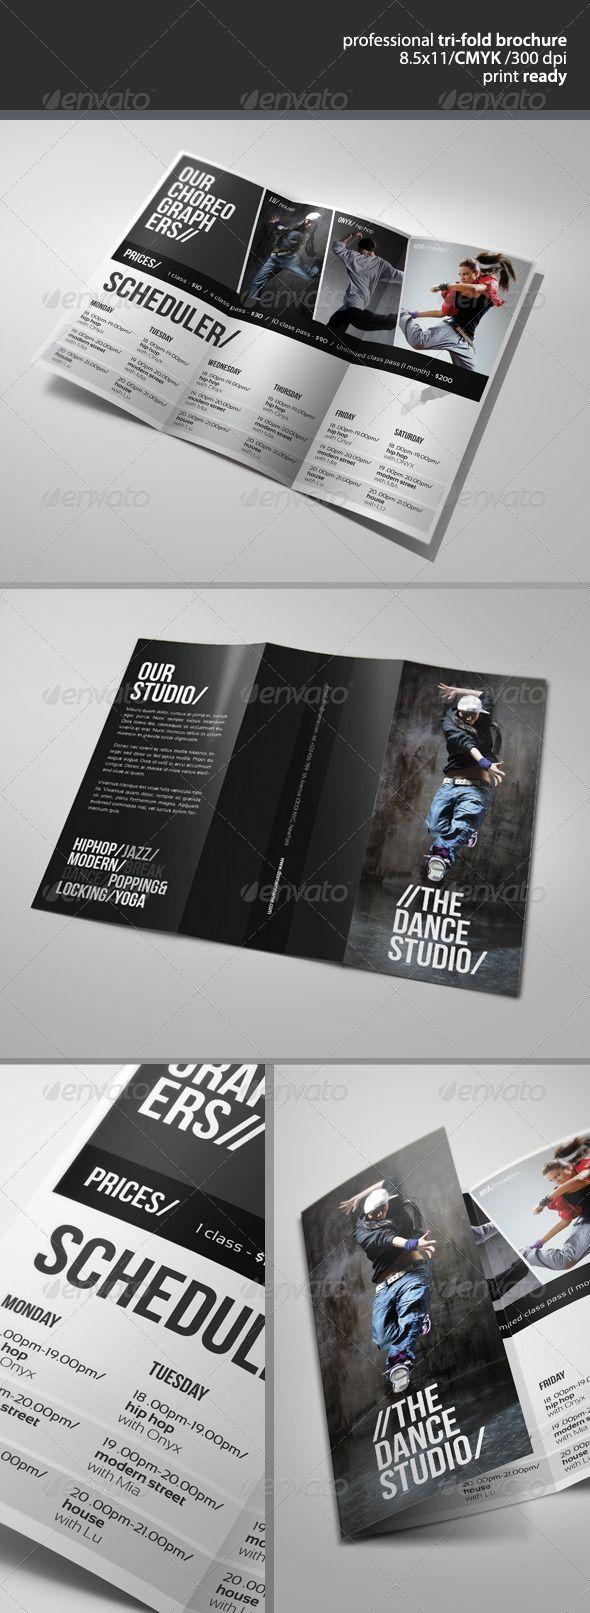 Dance Studio Brochure 2  - GraphicRiver Item for Sale